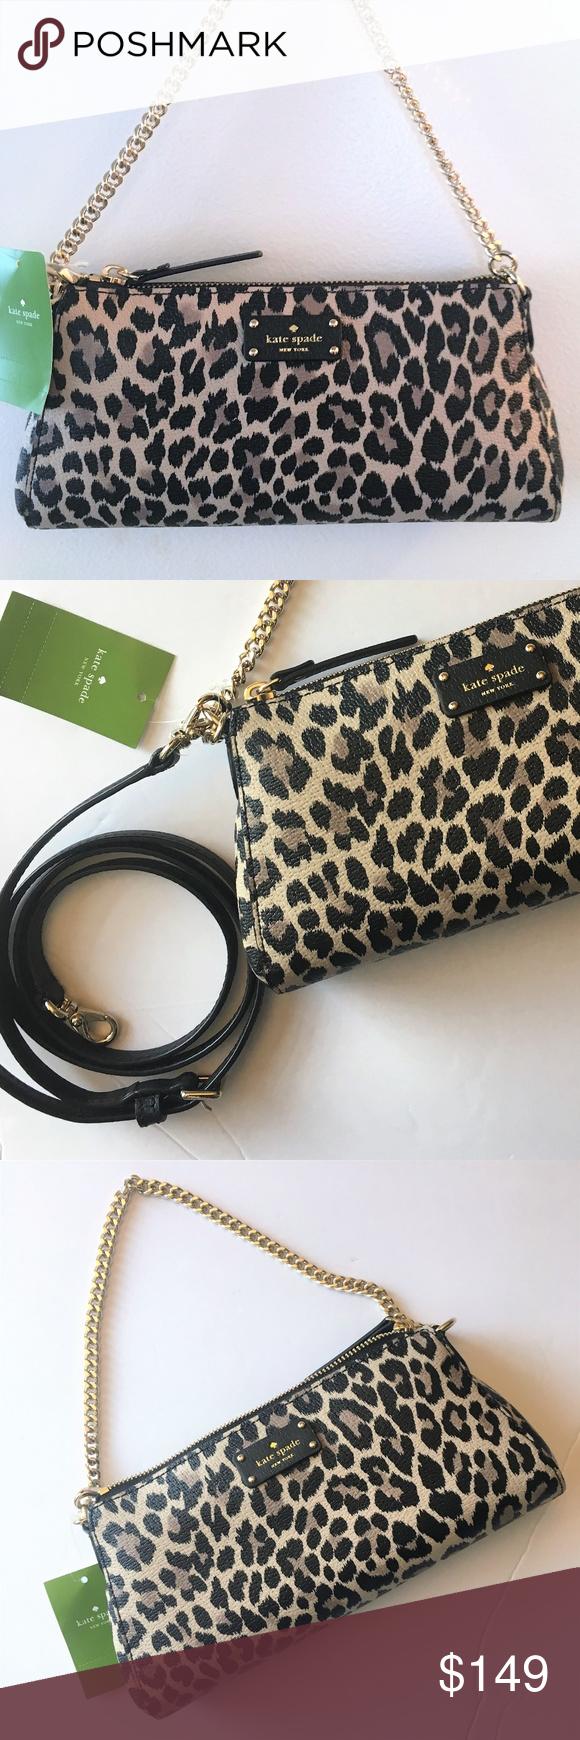 32b3b956dc Kate Spade Jane Crossbody Evening Bag ~ Leopard This lovely Grove Street  Jane bag by Kate